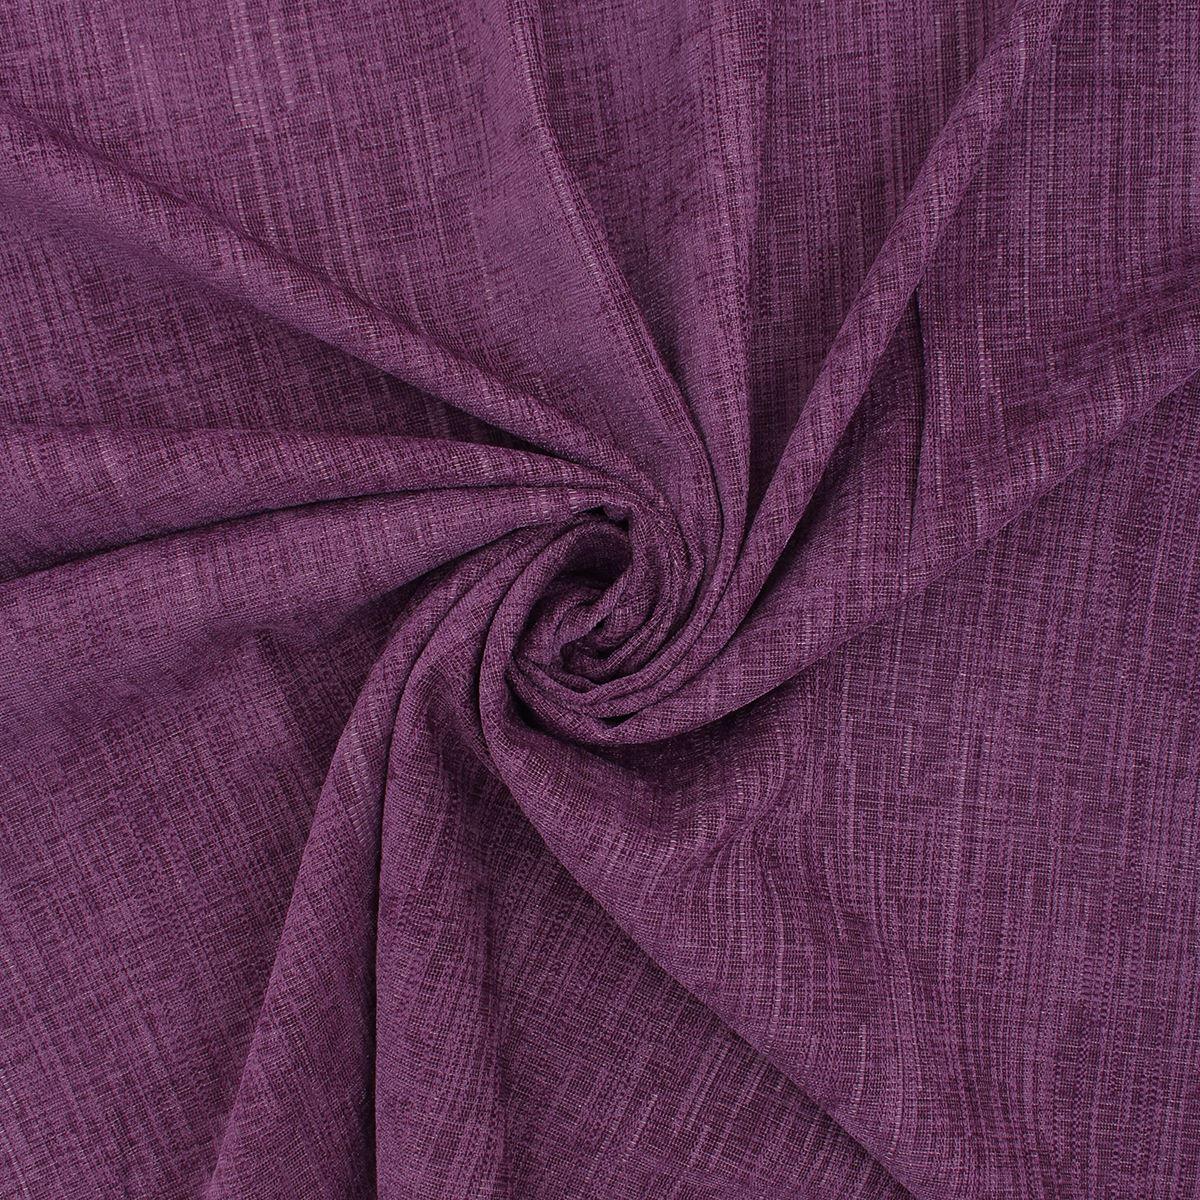 034-Chenille-034-Slubbed-Shabby-Worn-Look-Curtain-Cushion-Sofa-Upholstery-Fabric thumbnail 22